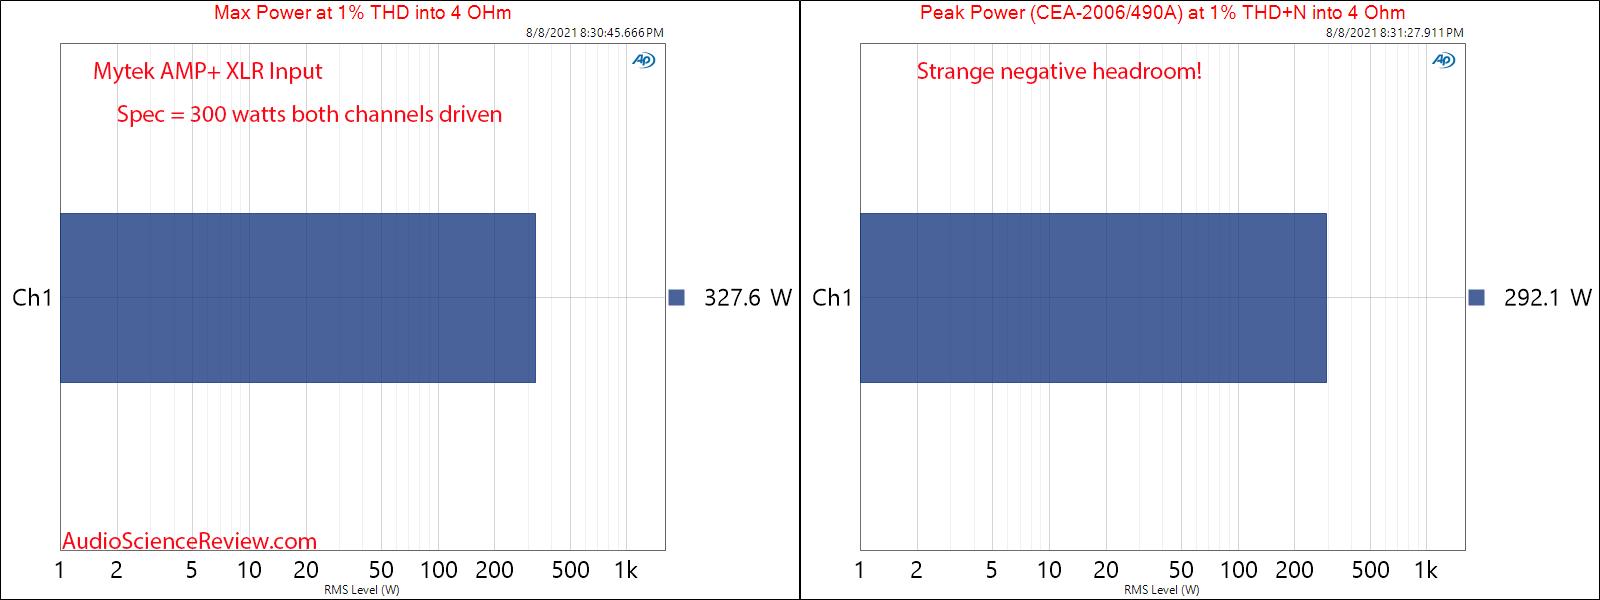 Mytek Amp+ Peak and Max Power into 4 ohm Measurements Balanced Amplifier.png